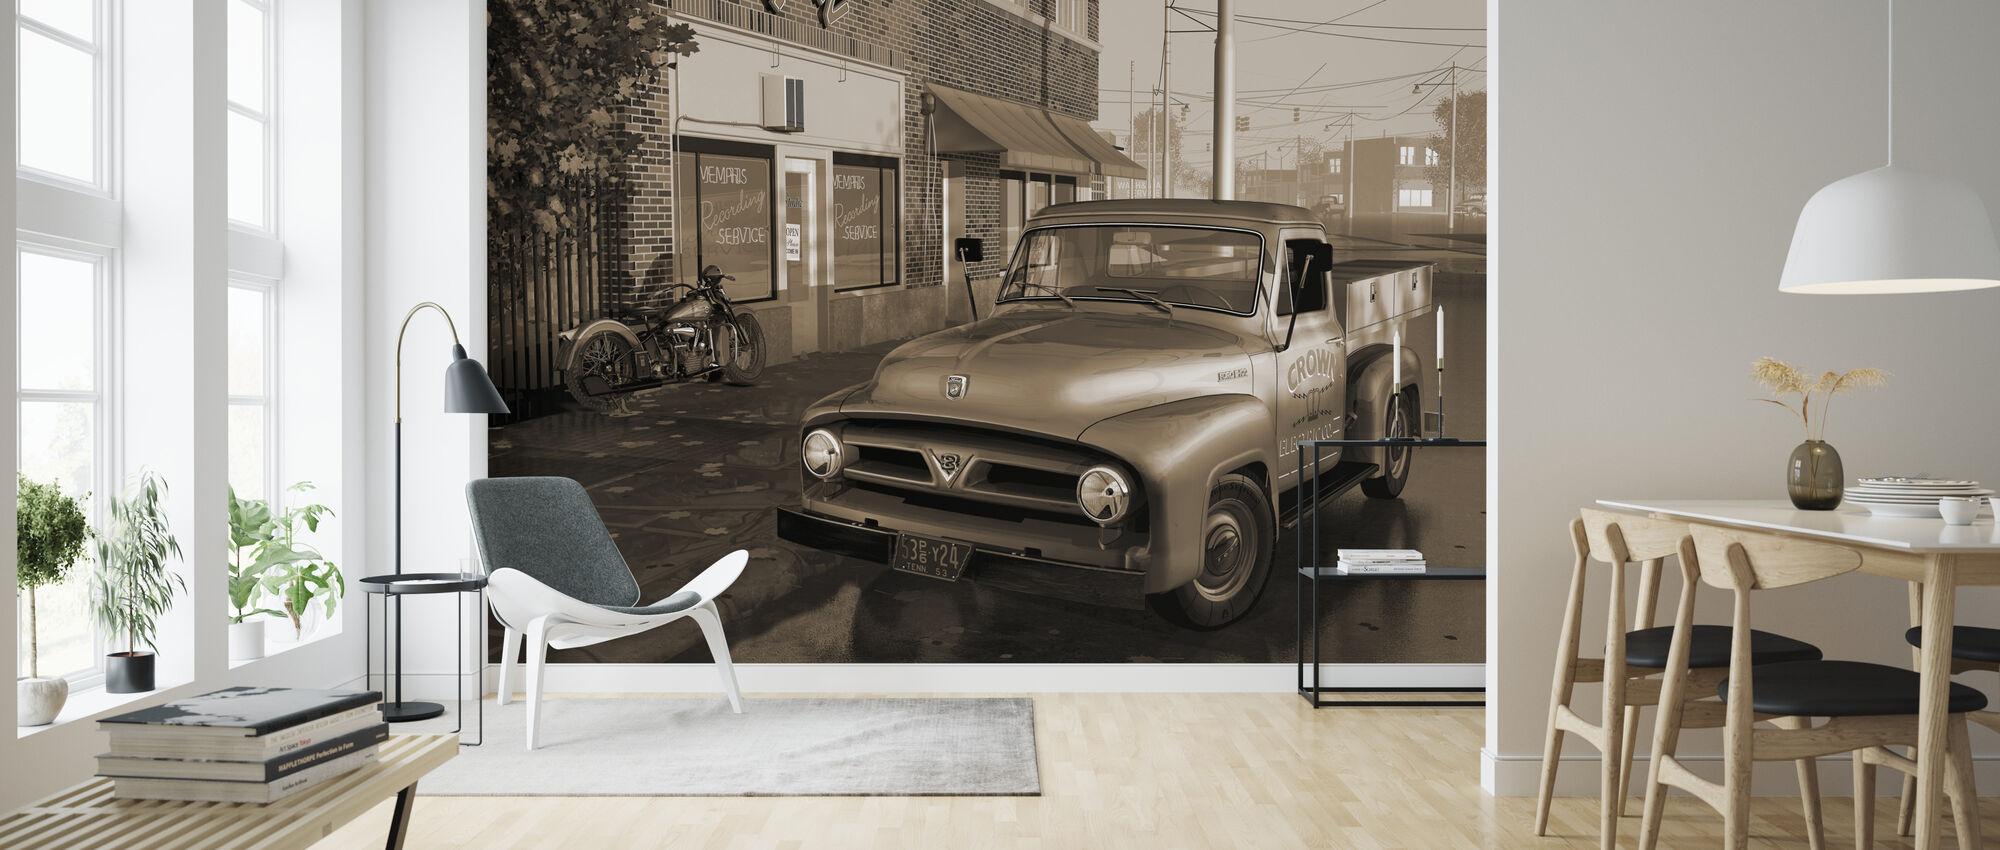 Truck Sepia - Wallpaper - Living Room